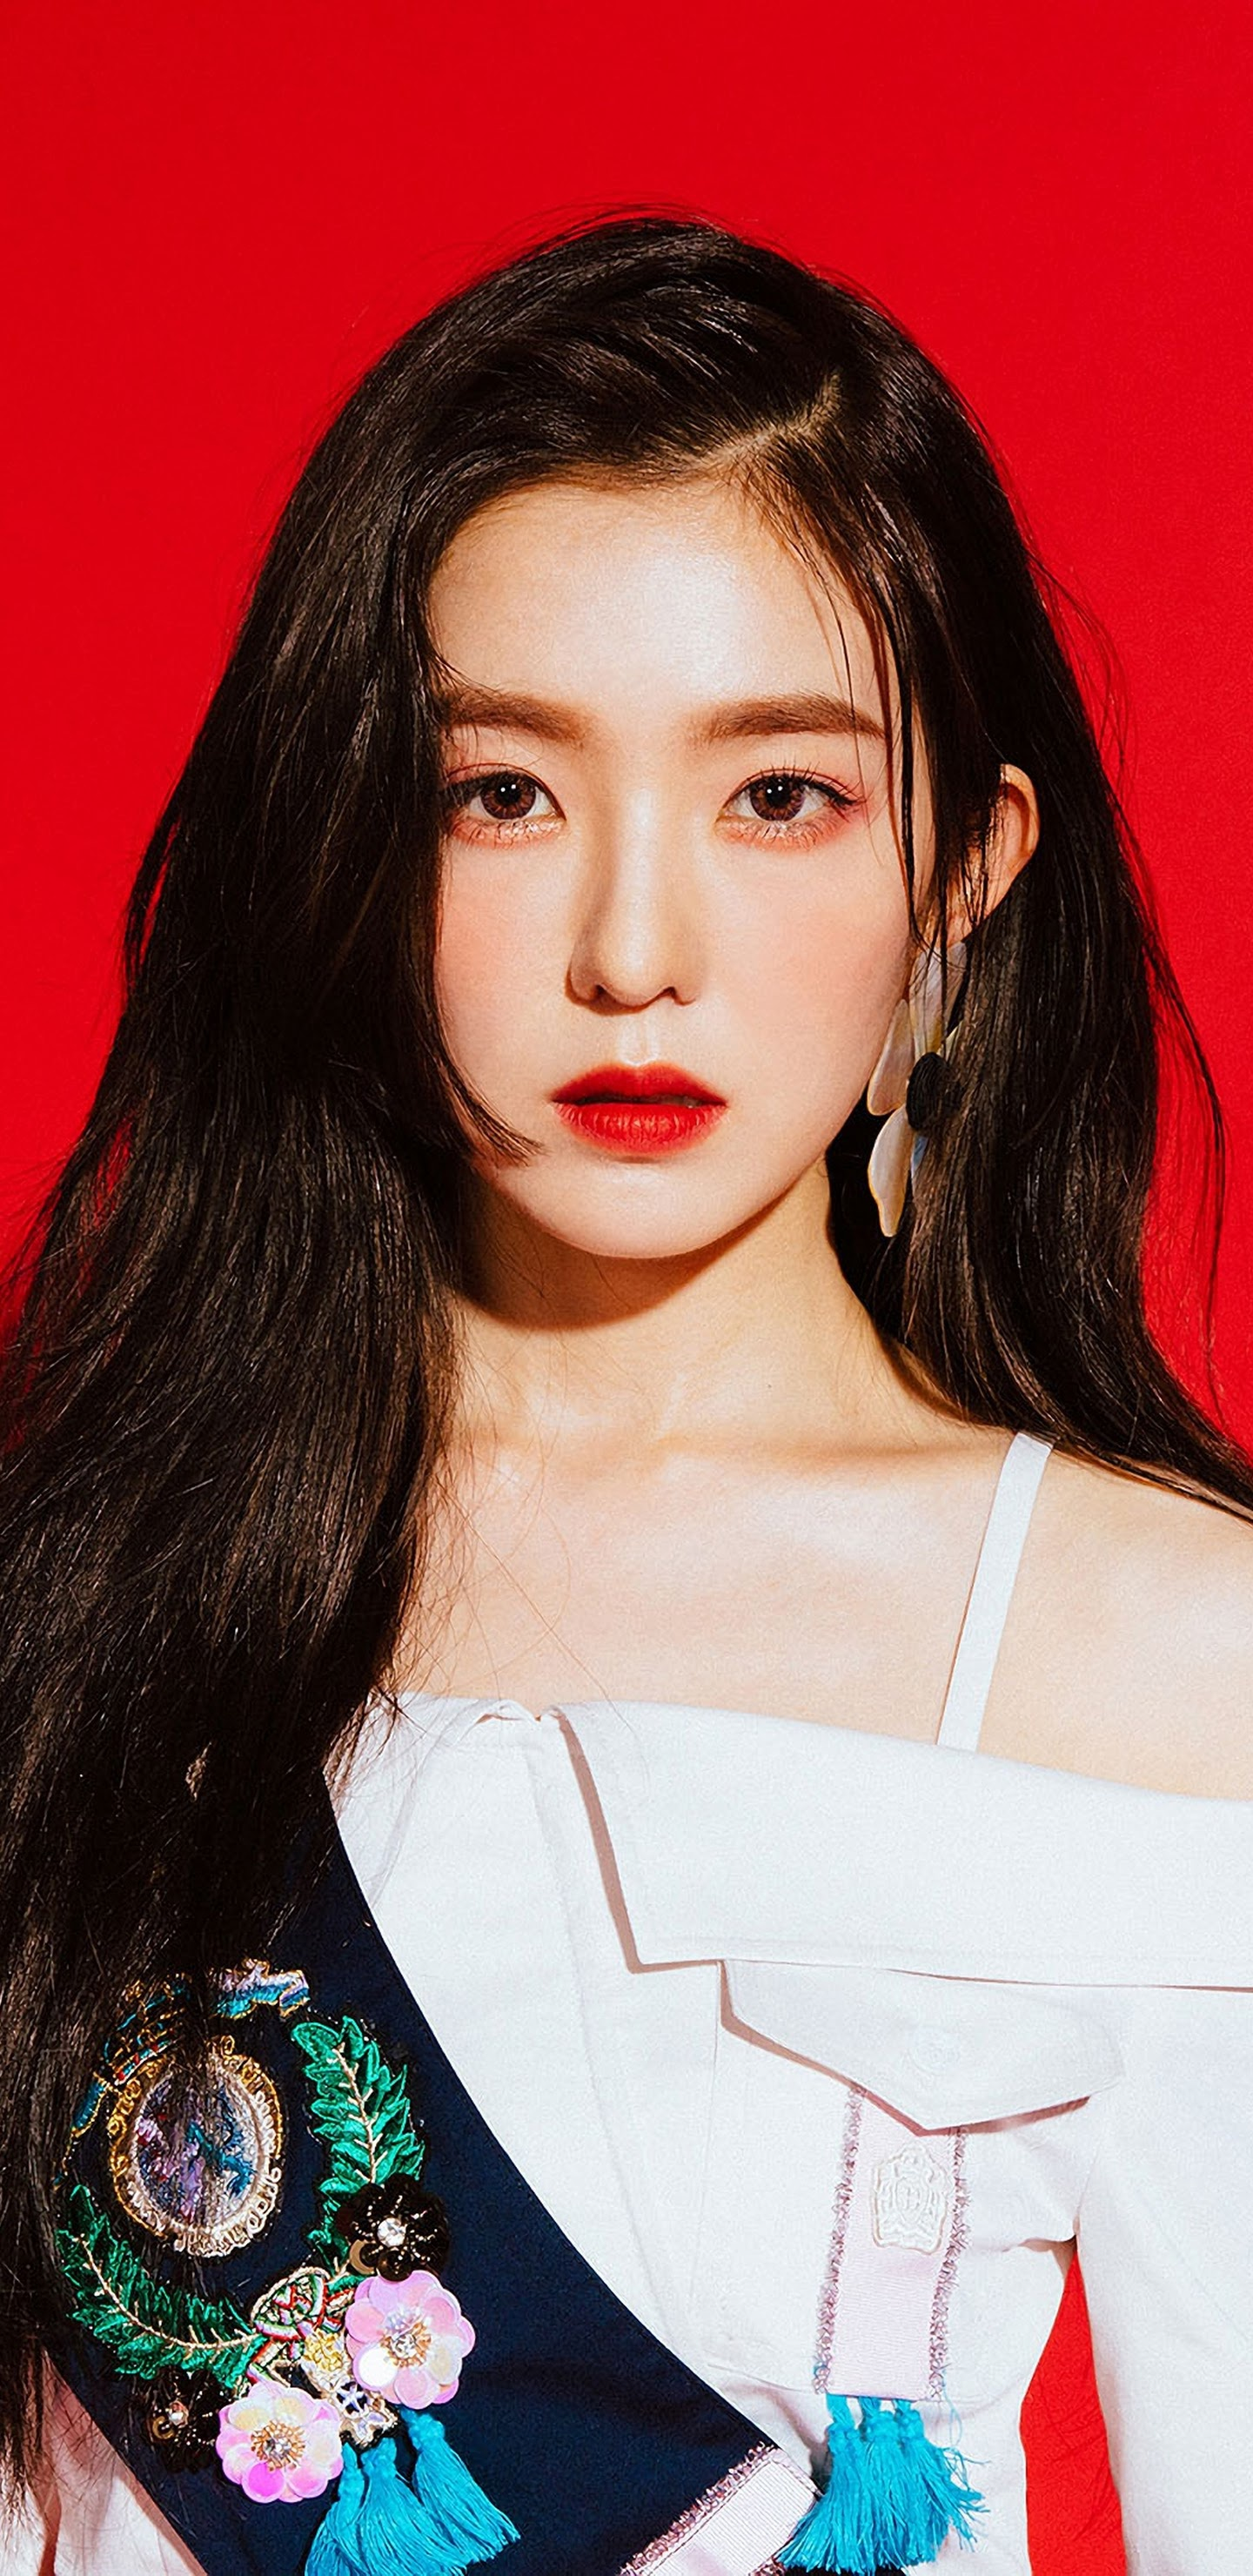 Is Irene of Red Velvet 20 years old   Quora